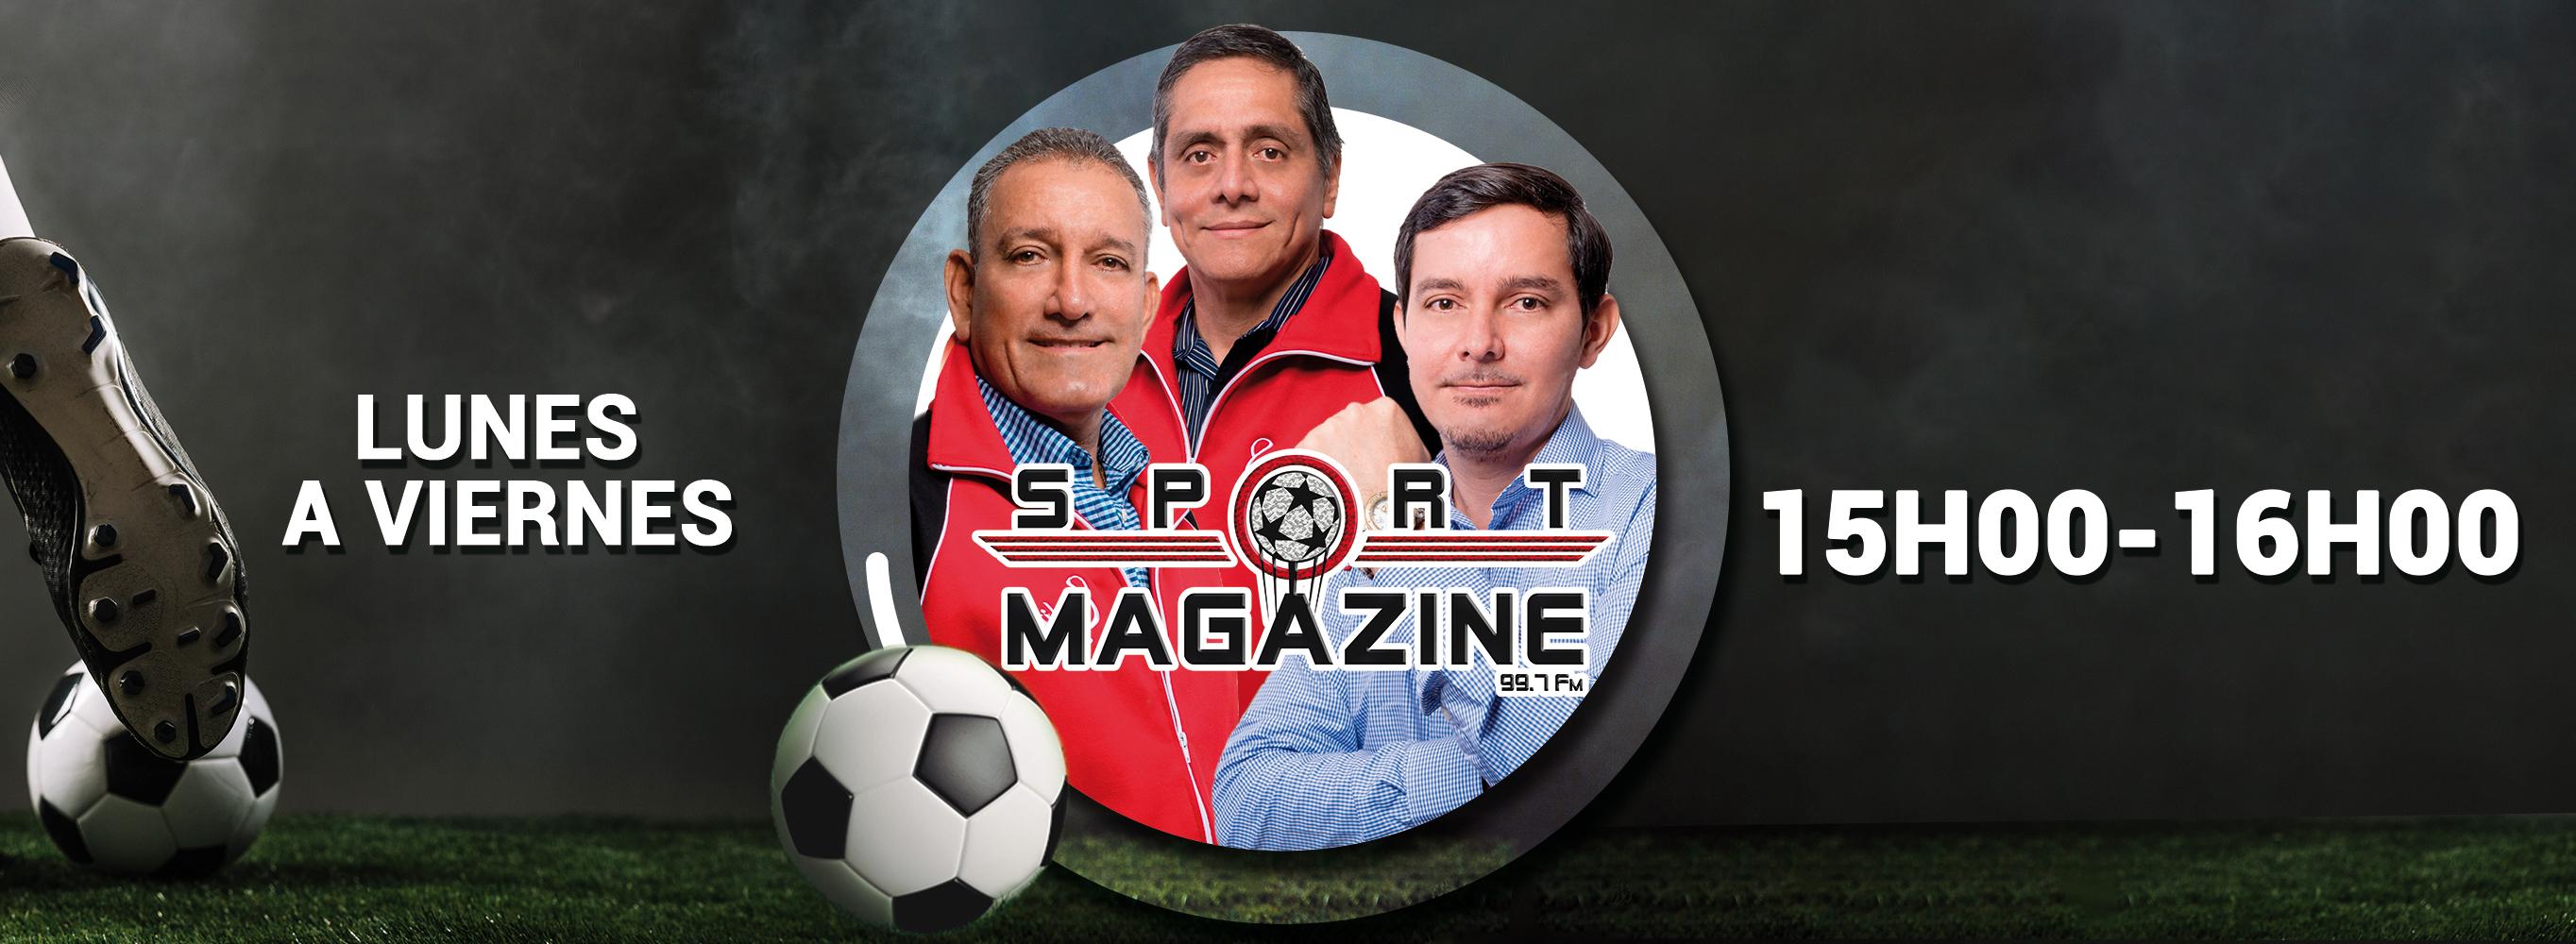 https://radioelite997.com/wp-content/uploads/2016/07/sport-magazine-2.jpg